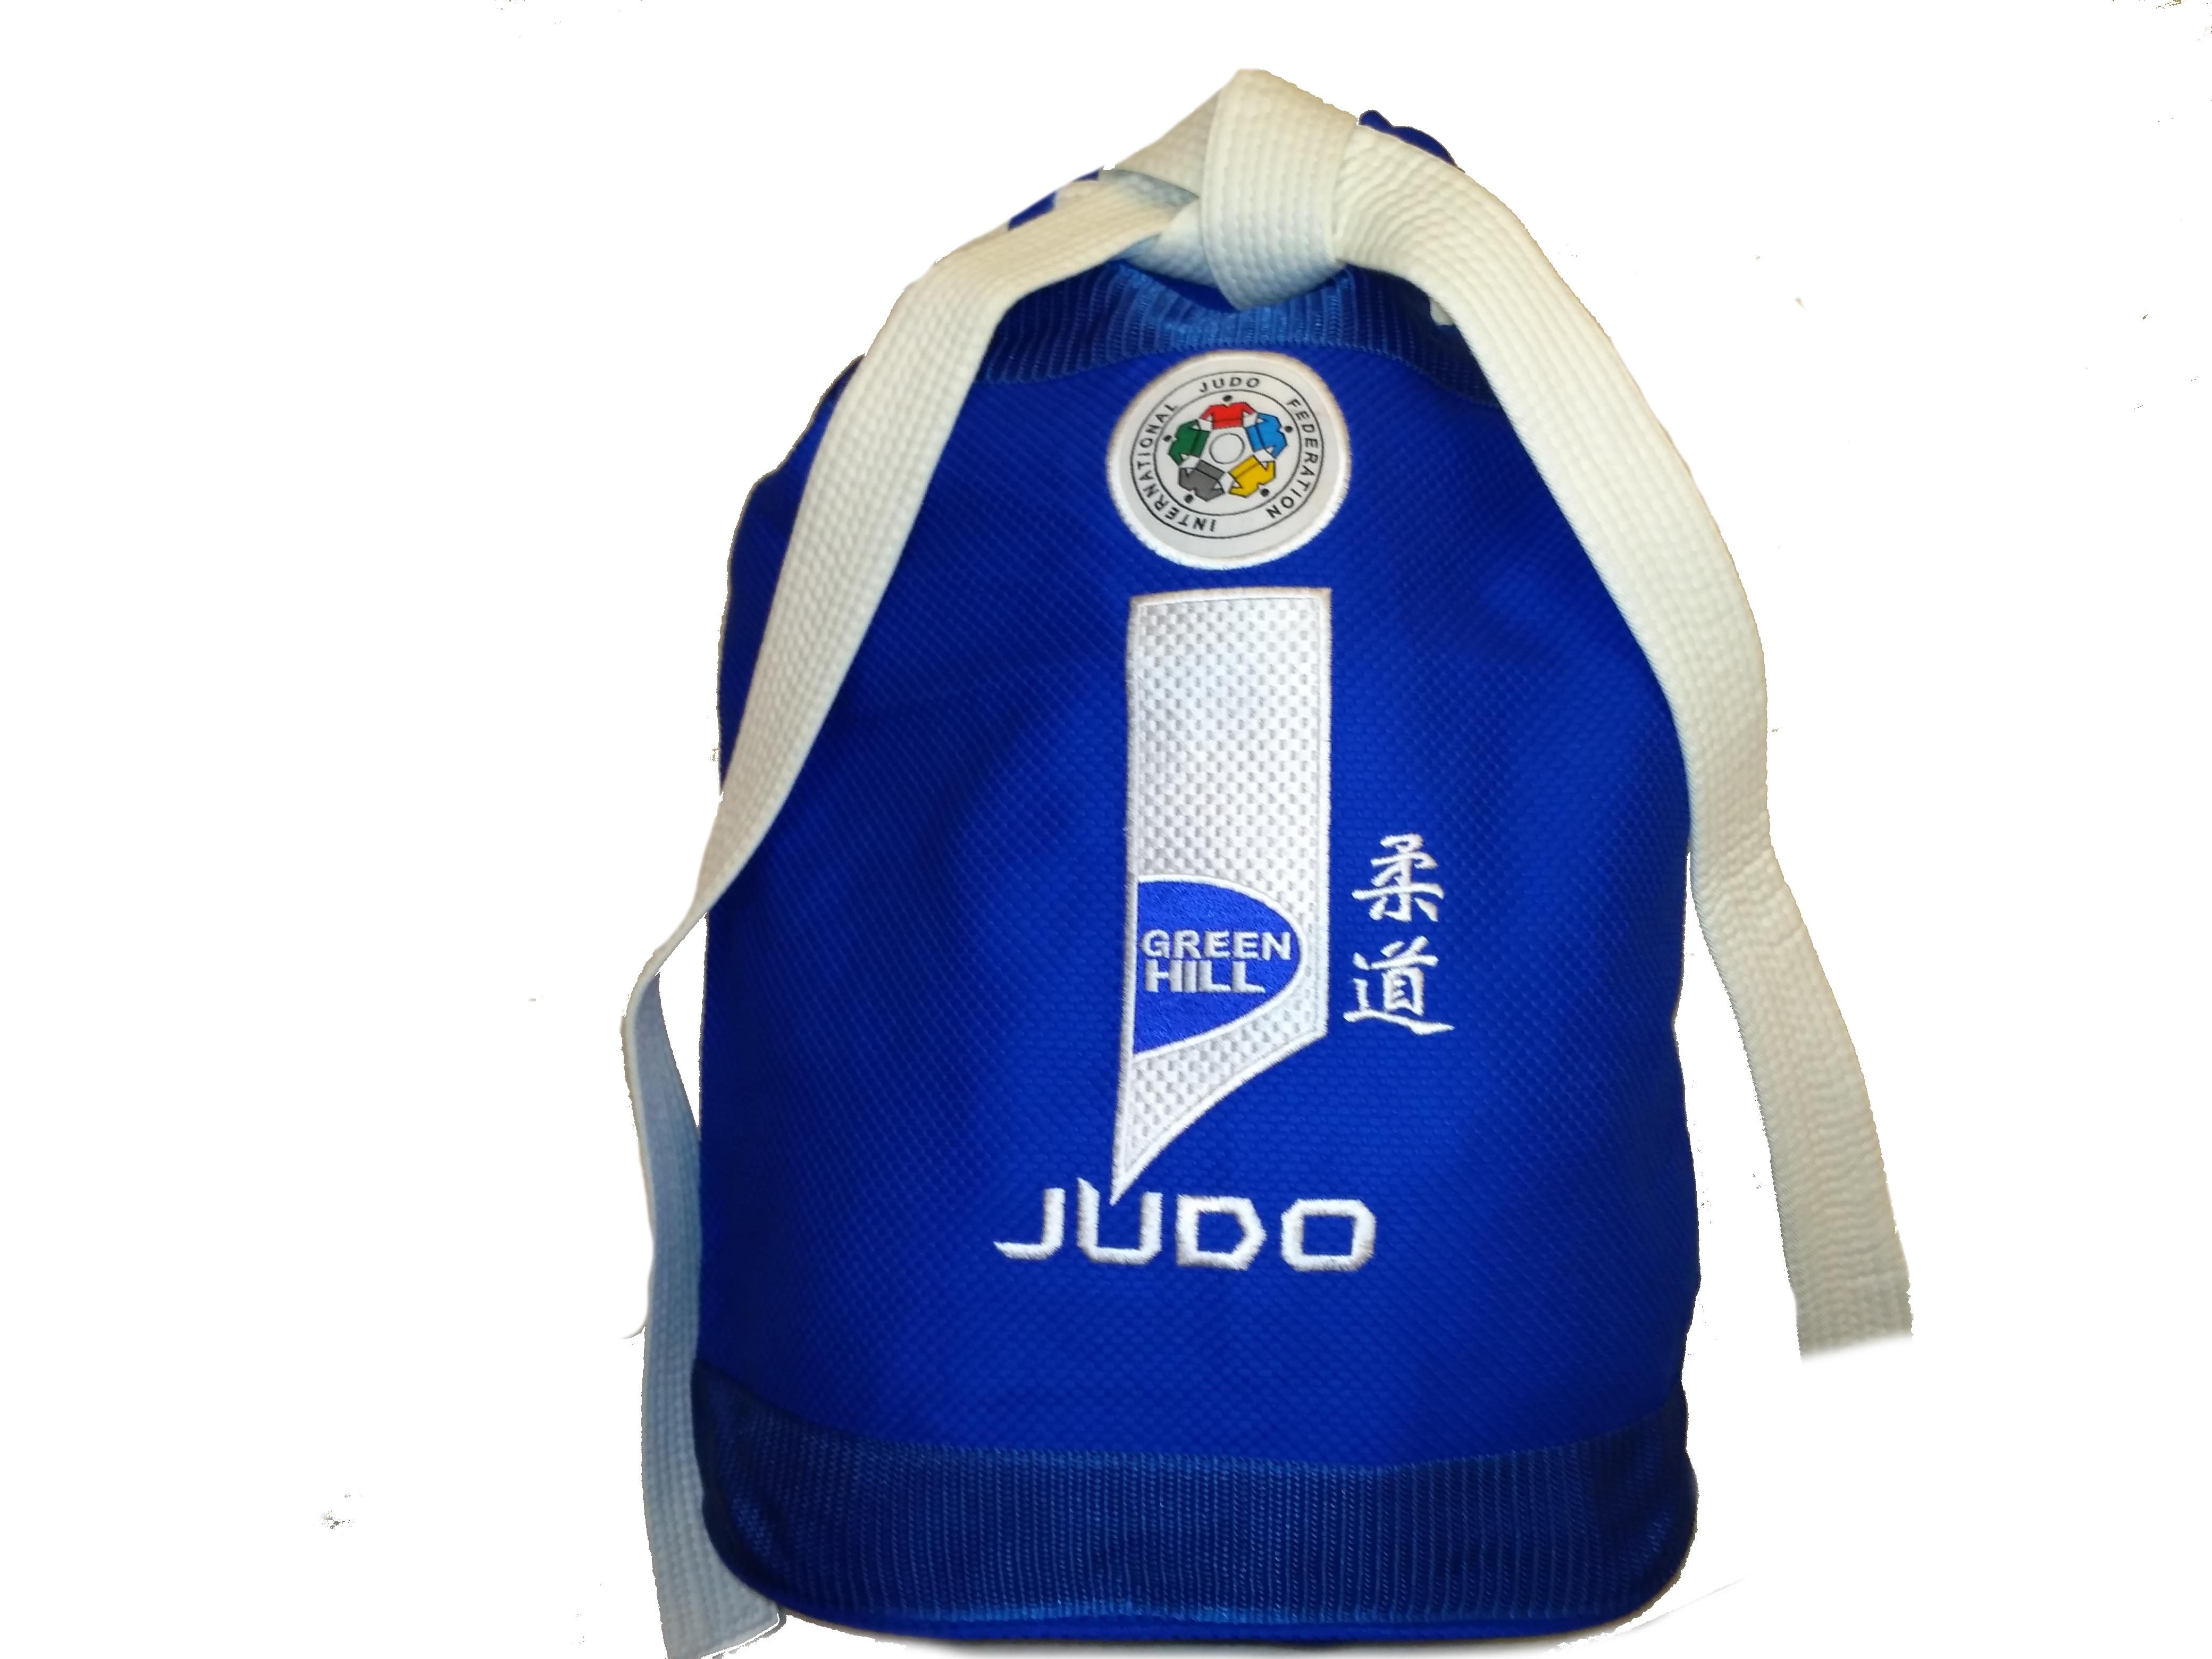 рюкзак дзюдо грин хилл